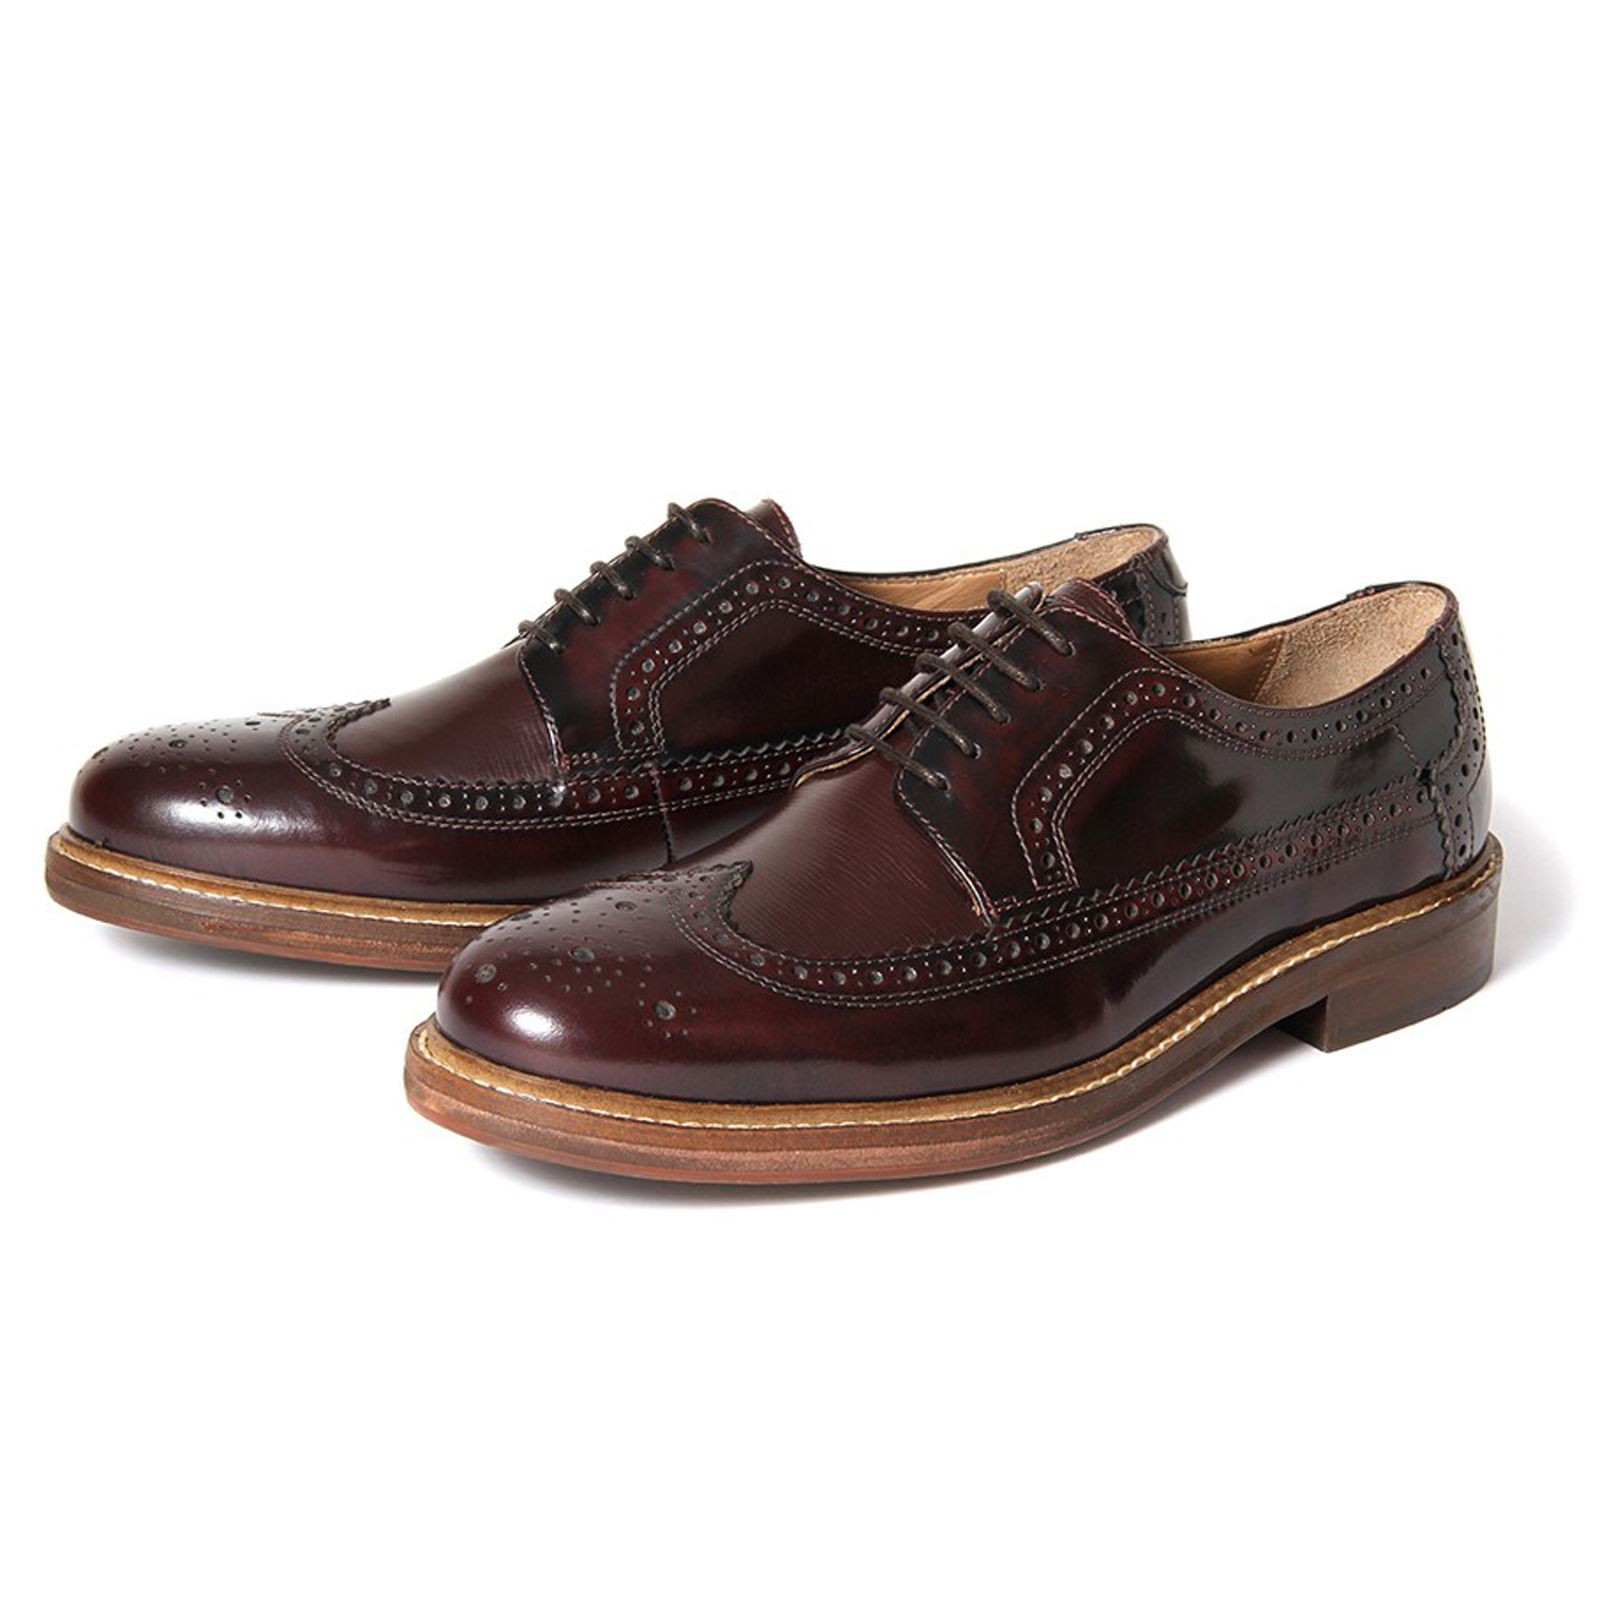 hudson shoes image is loading h-by-hudson-shoes-callaghan-hi-shine-bordo- aiafgwe